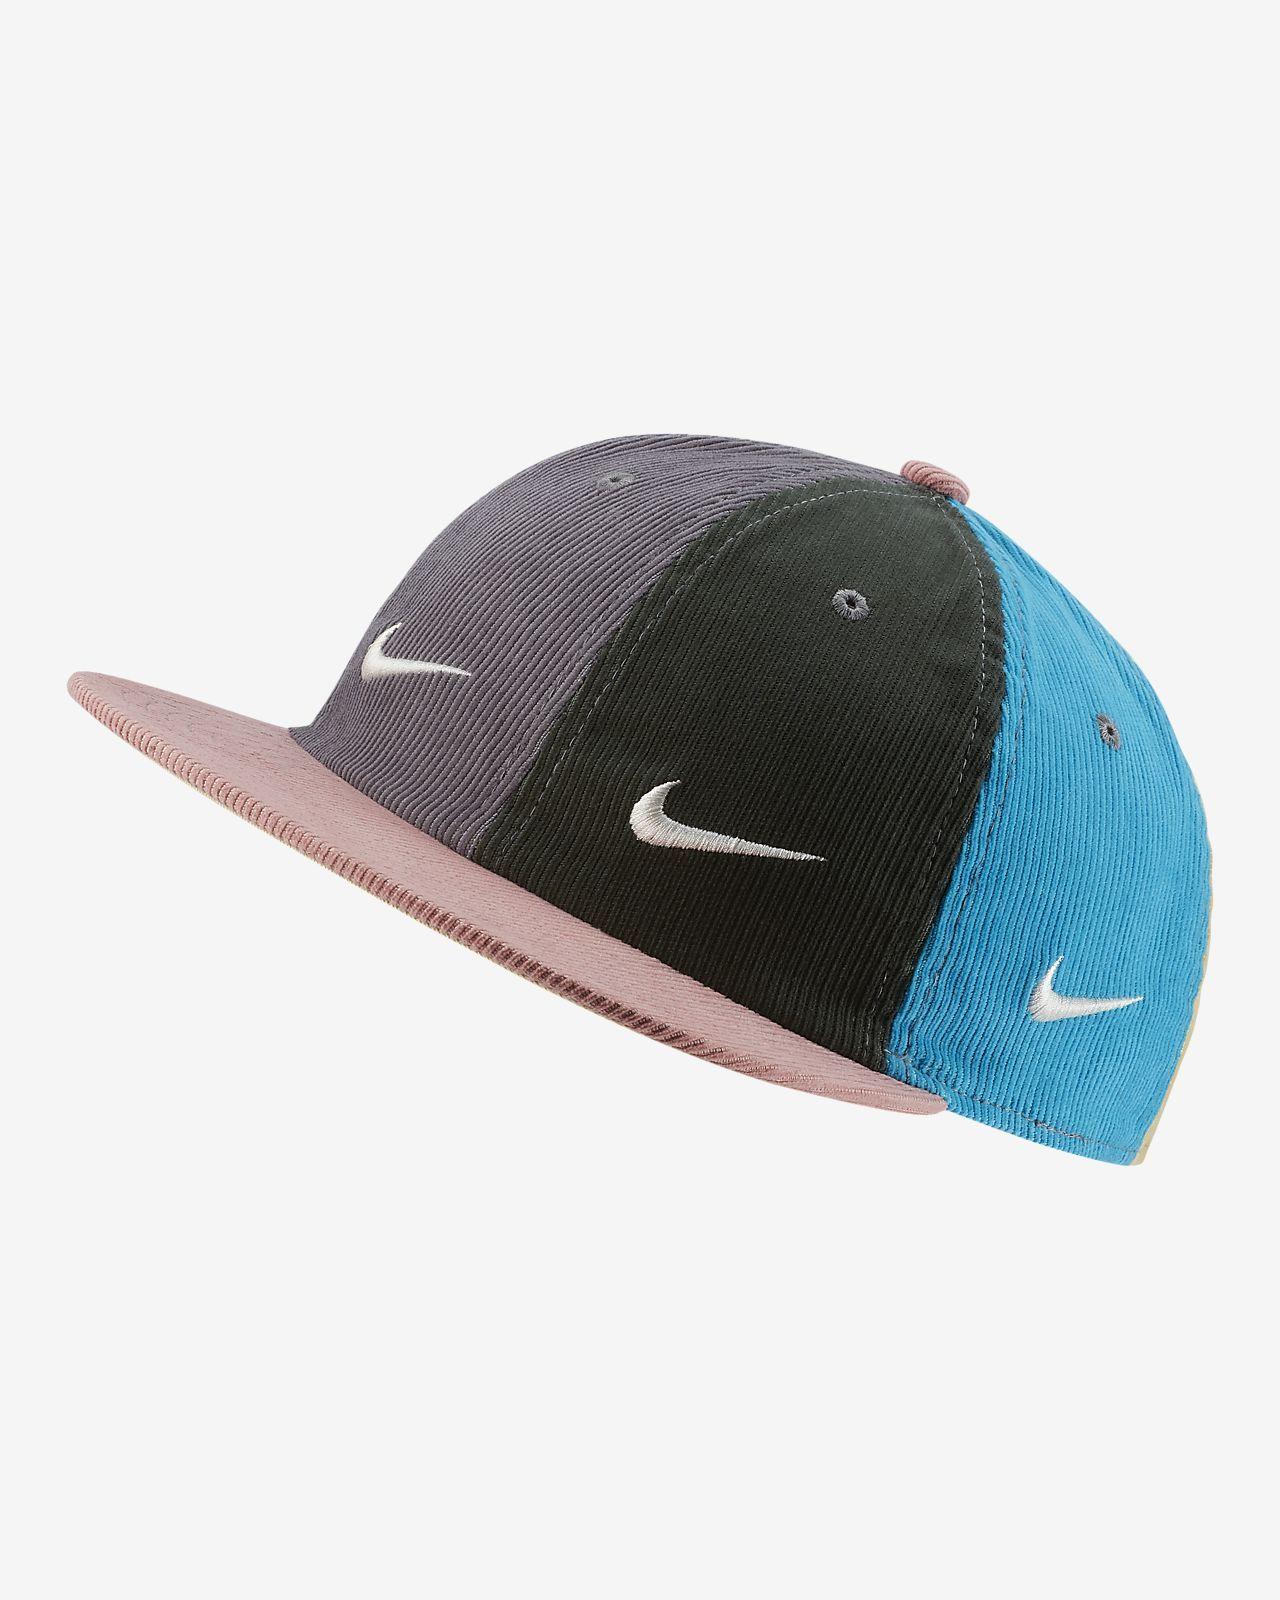 Nike Sportswear Heritage 86 QS Adjustable Hat  e6f175647a8